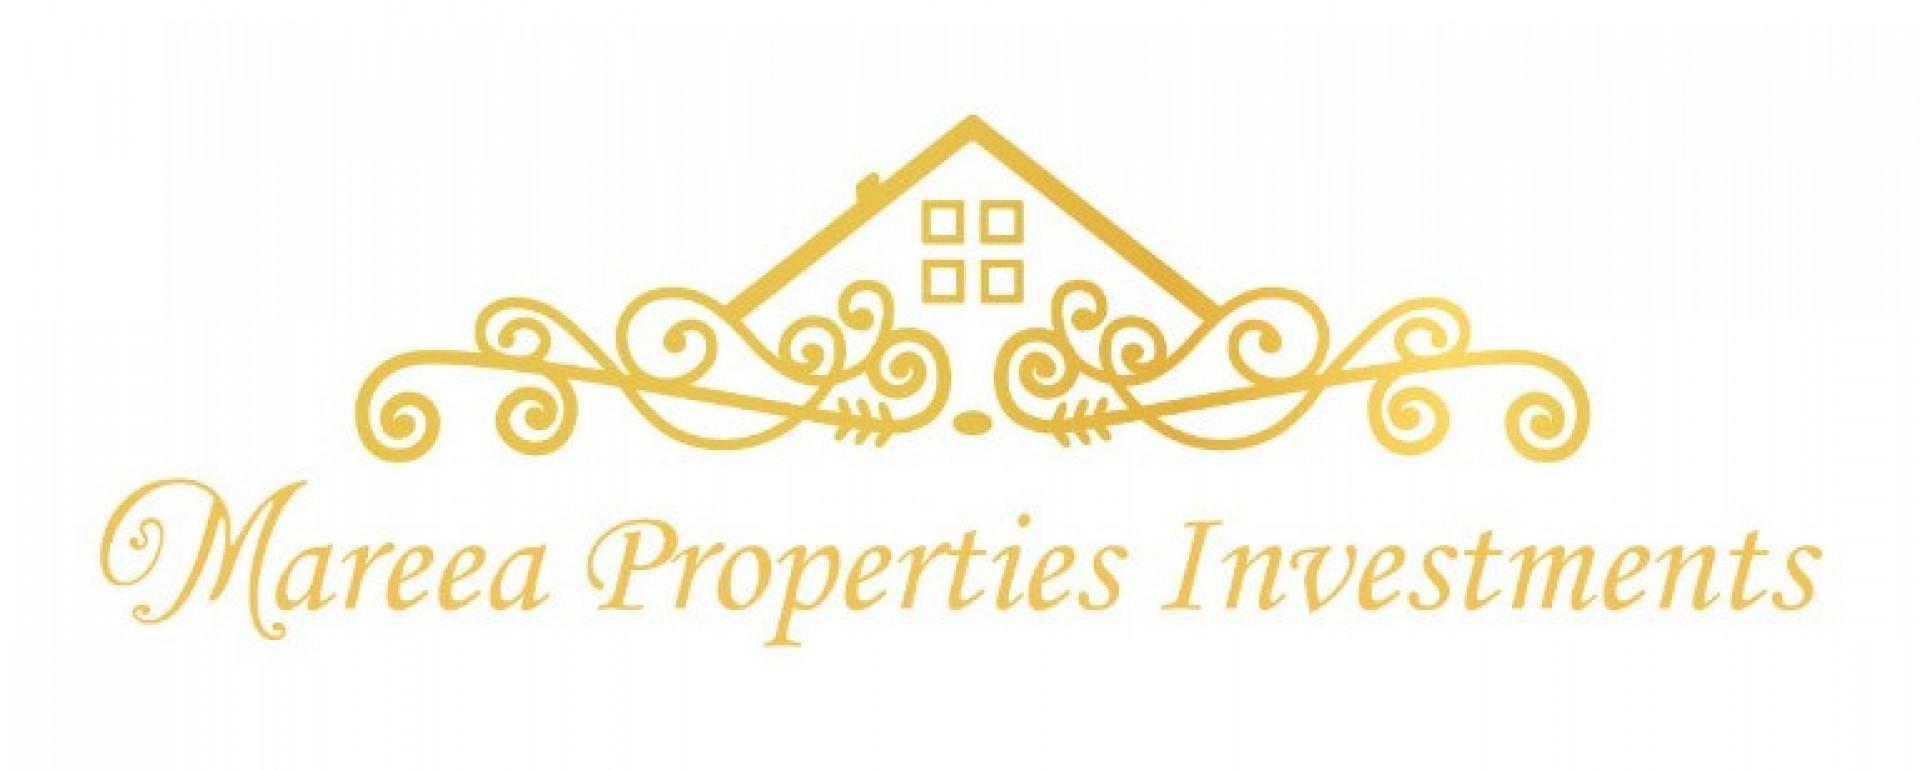 Mareea Properties Investments